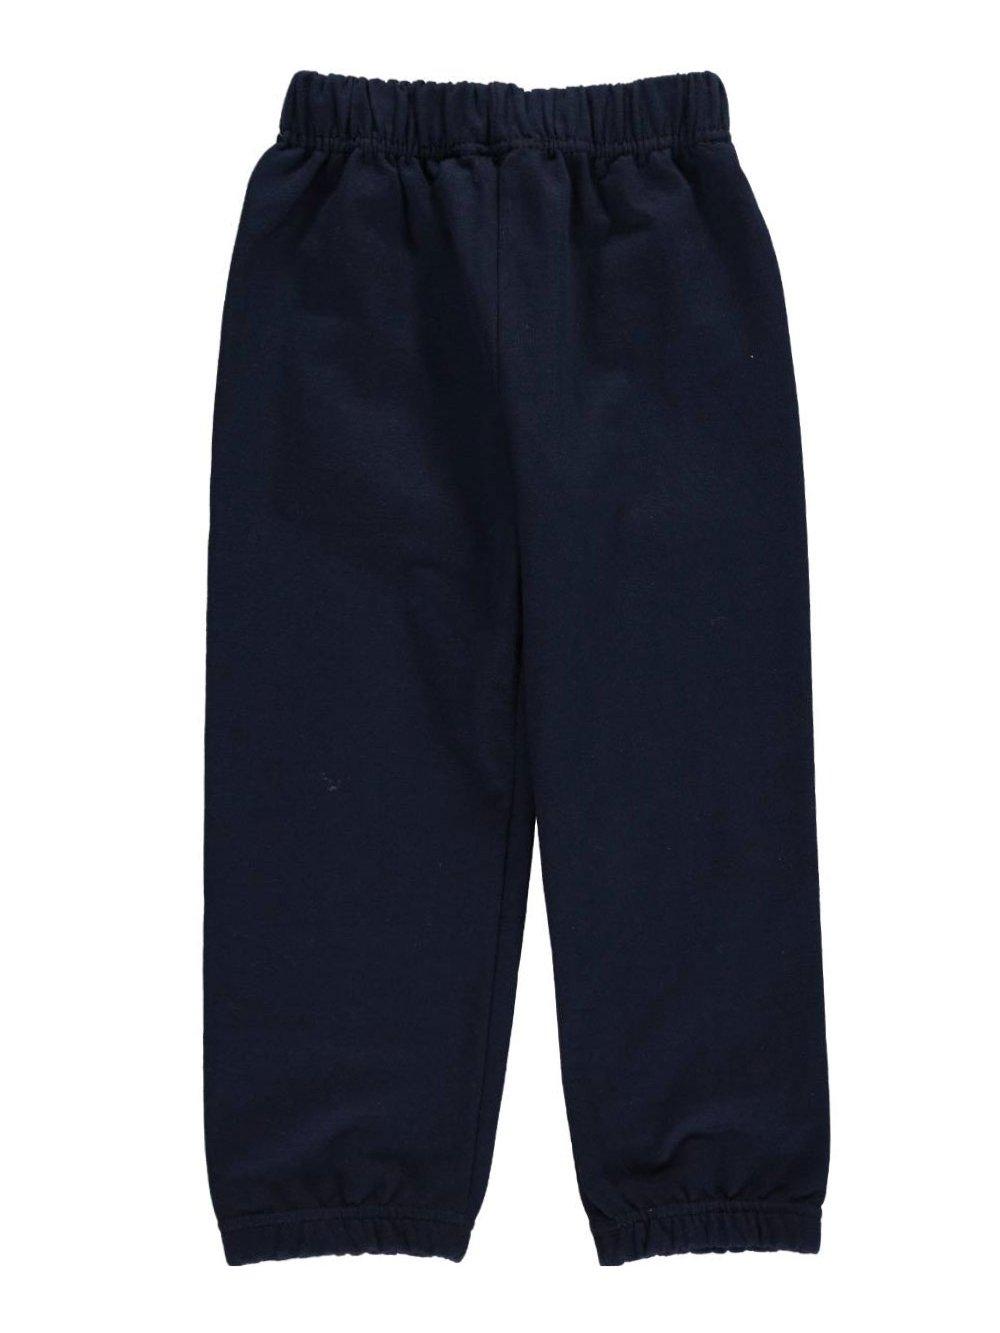 TATO Little Boys' Fleece Sweatpants